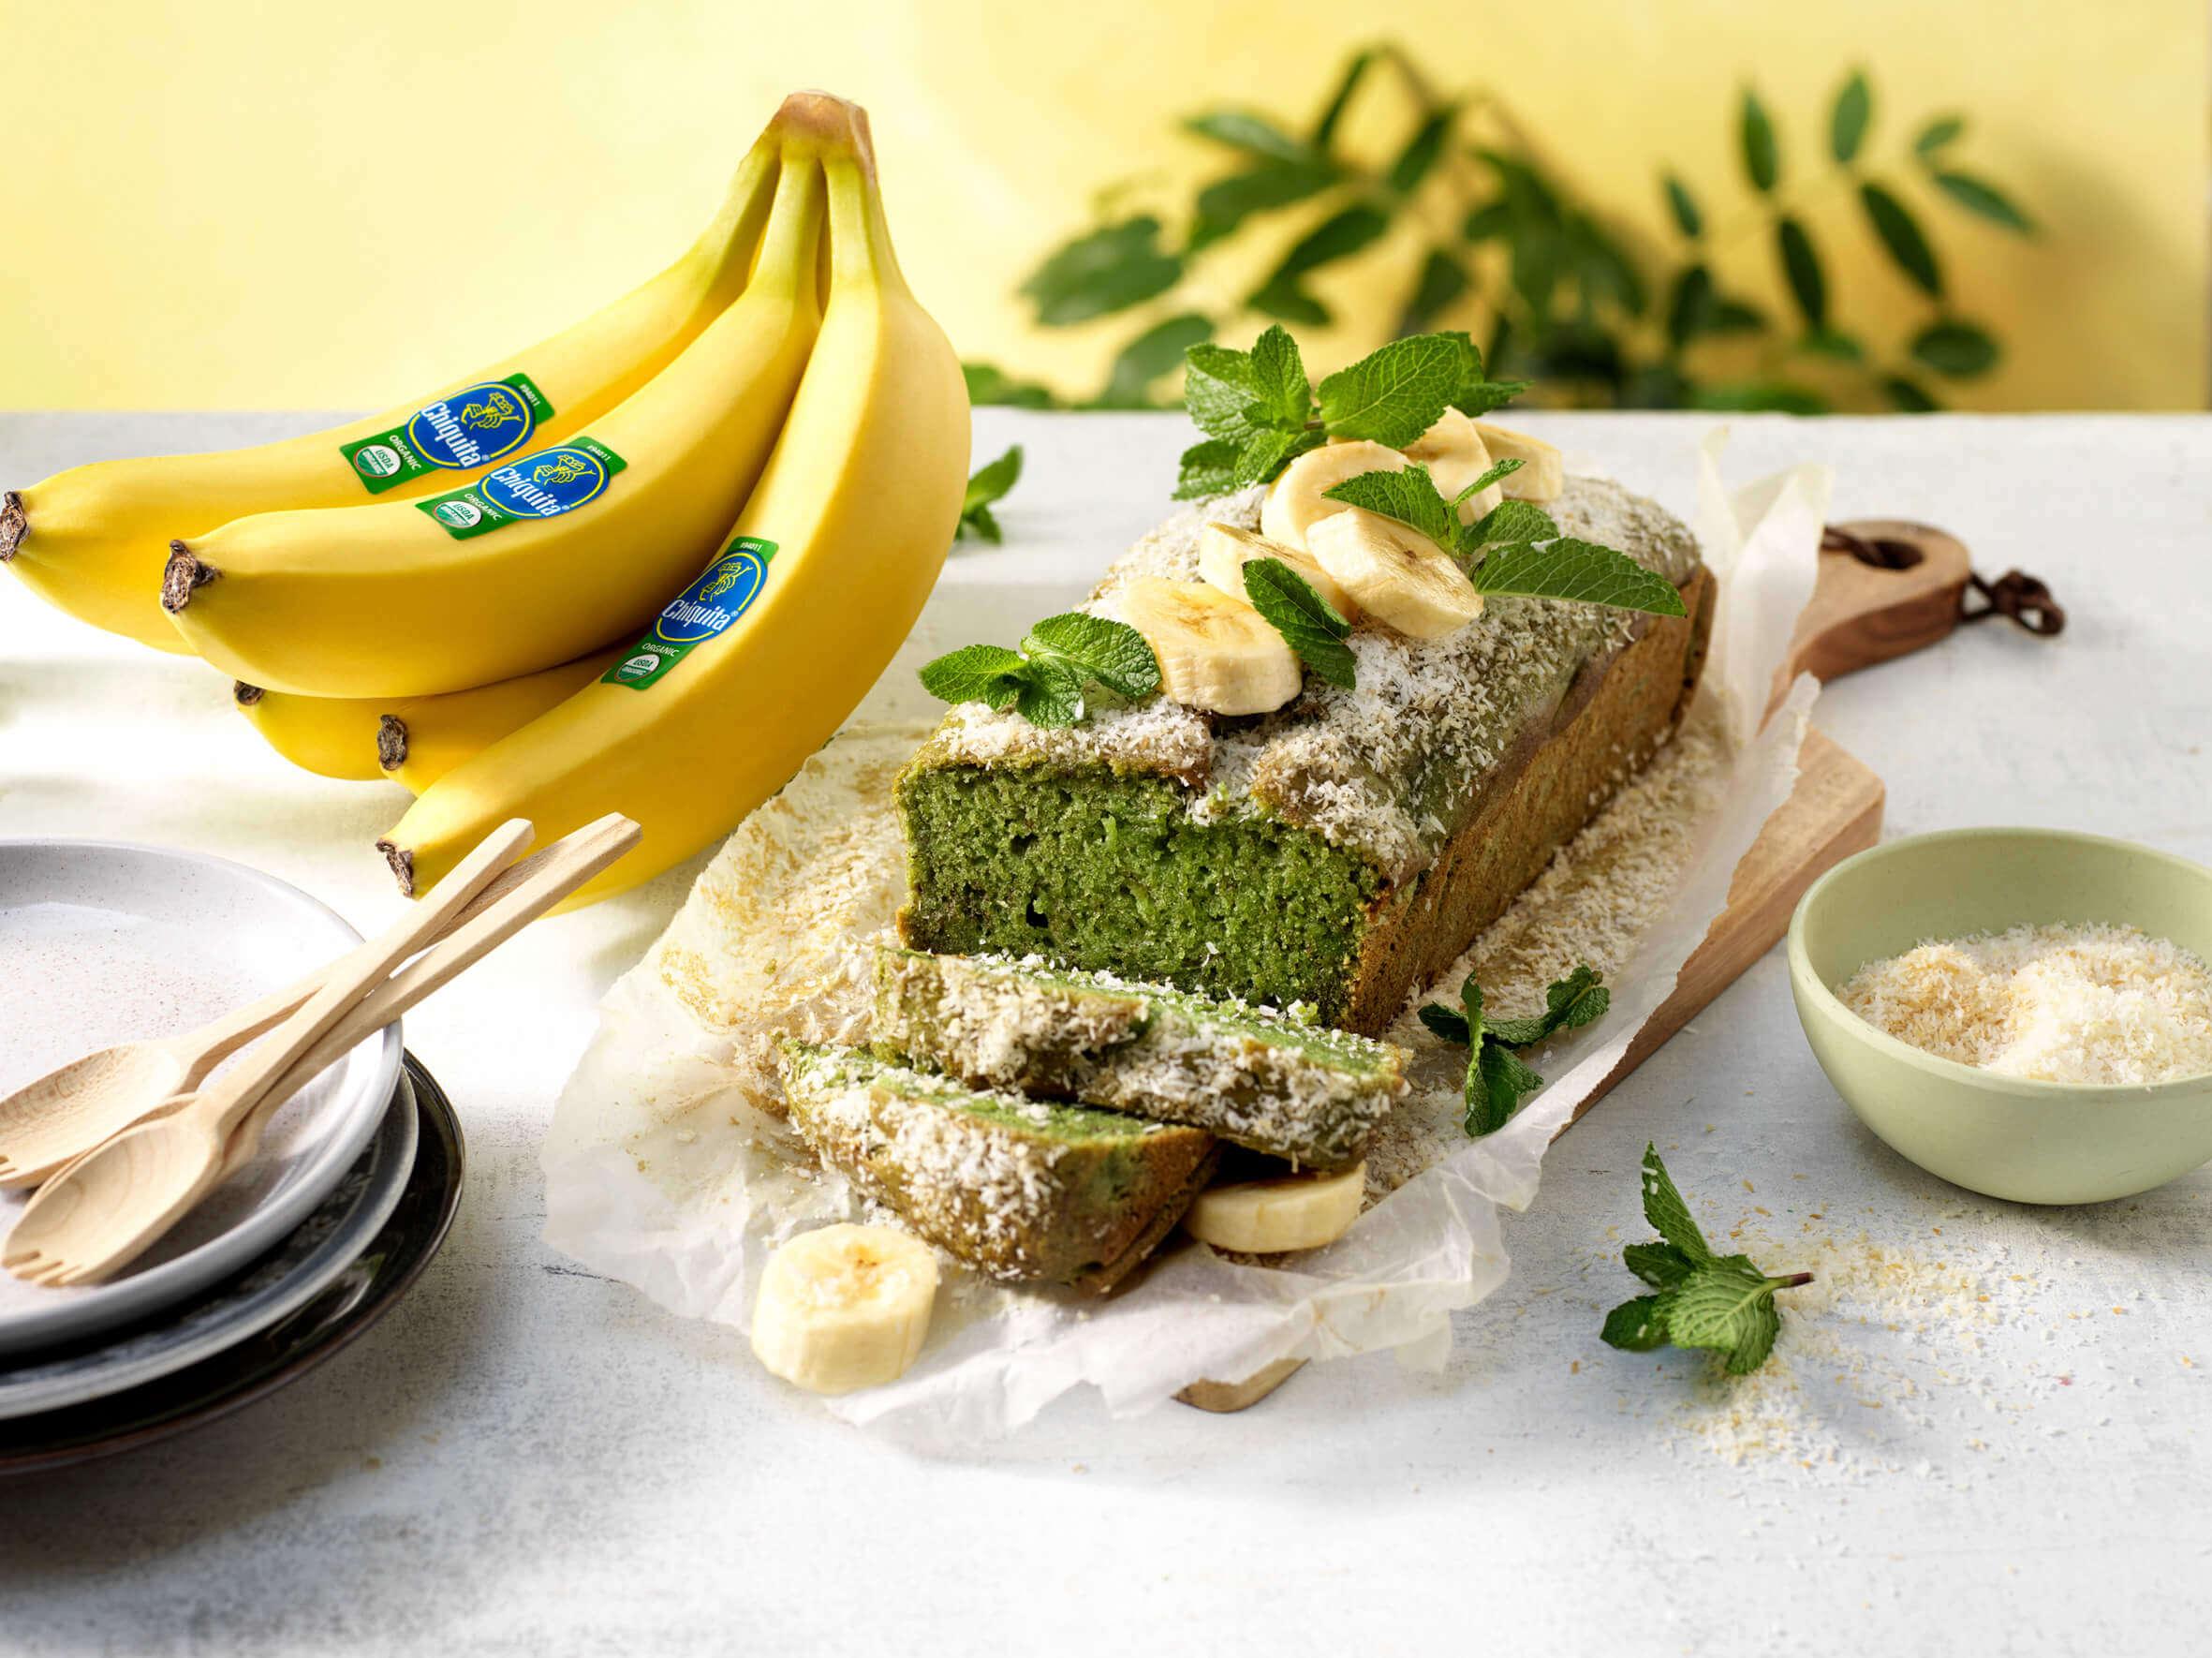 Vegan pandan organic Chiquita banana bread